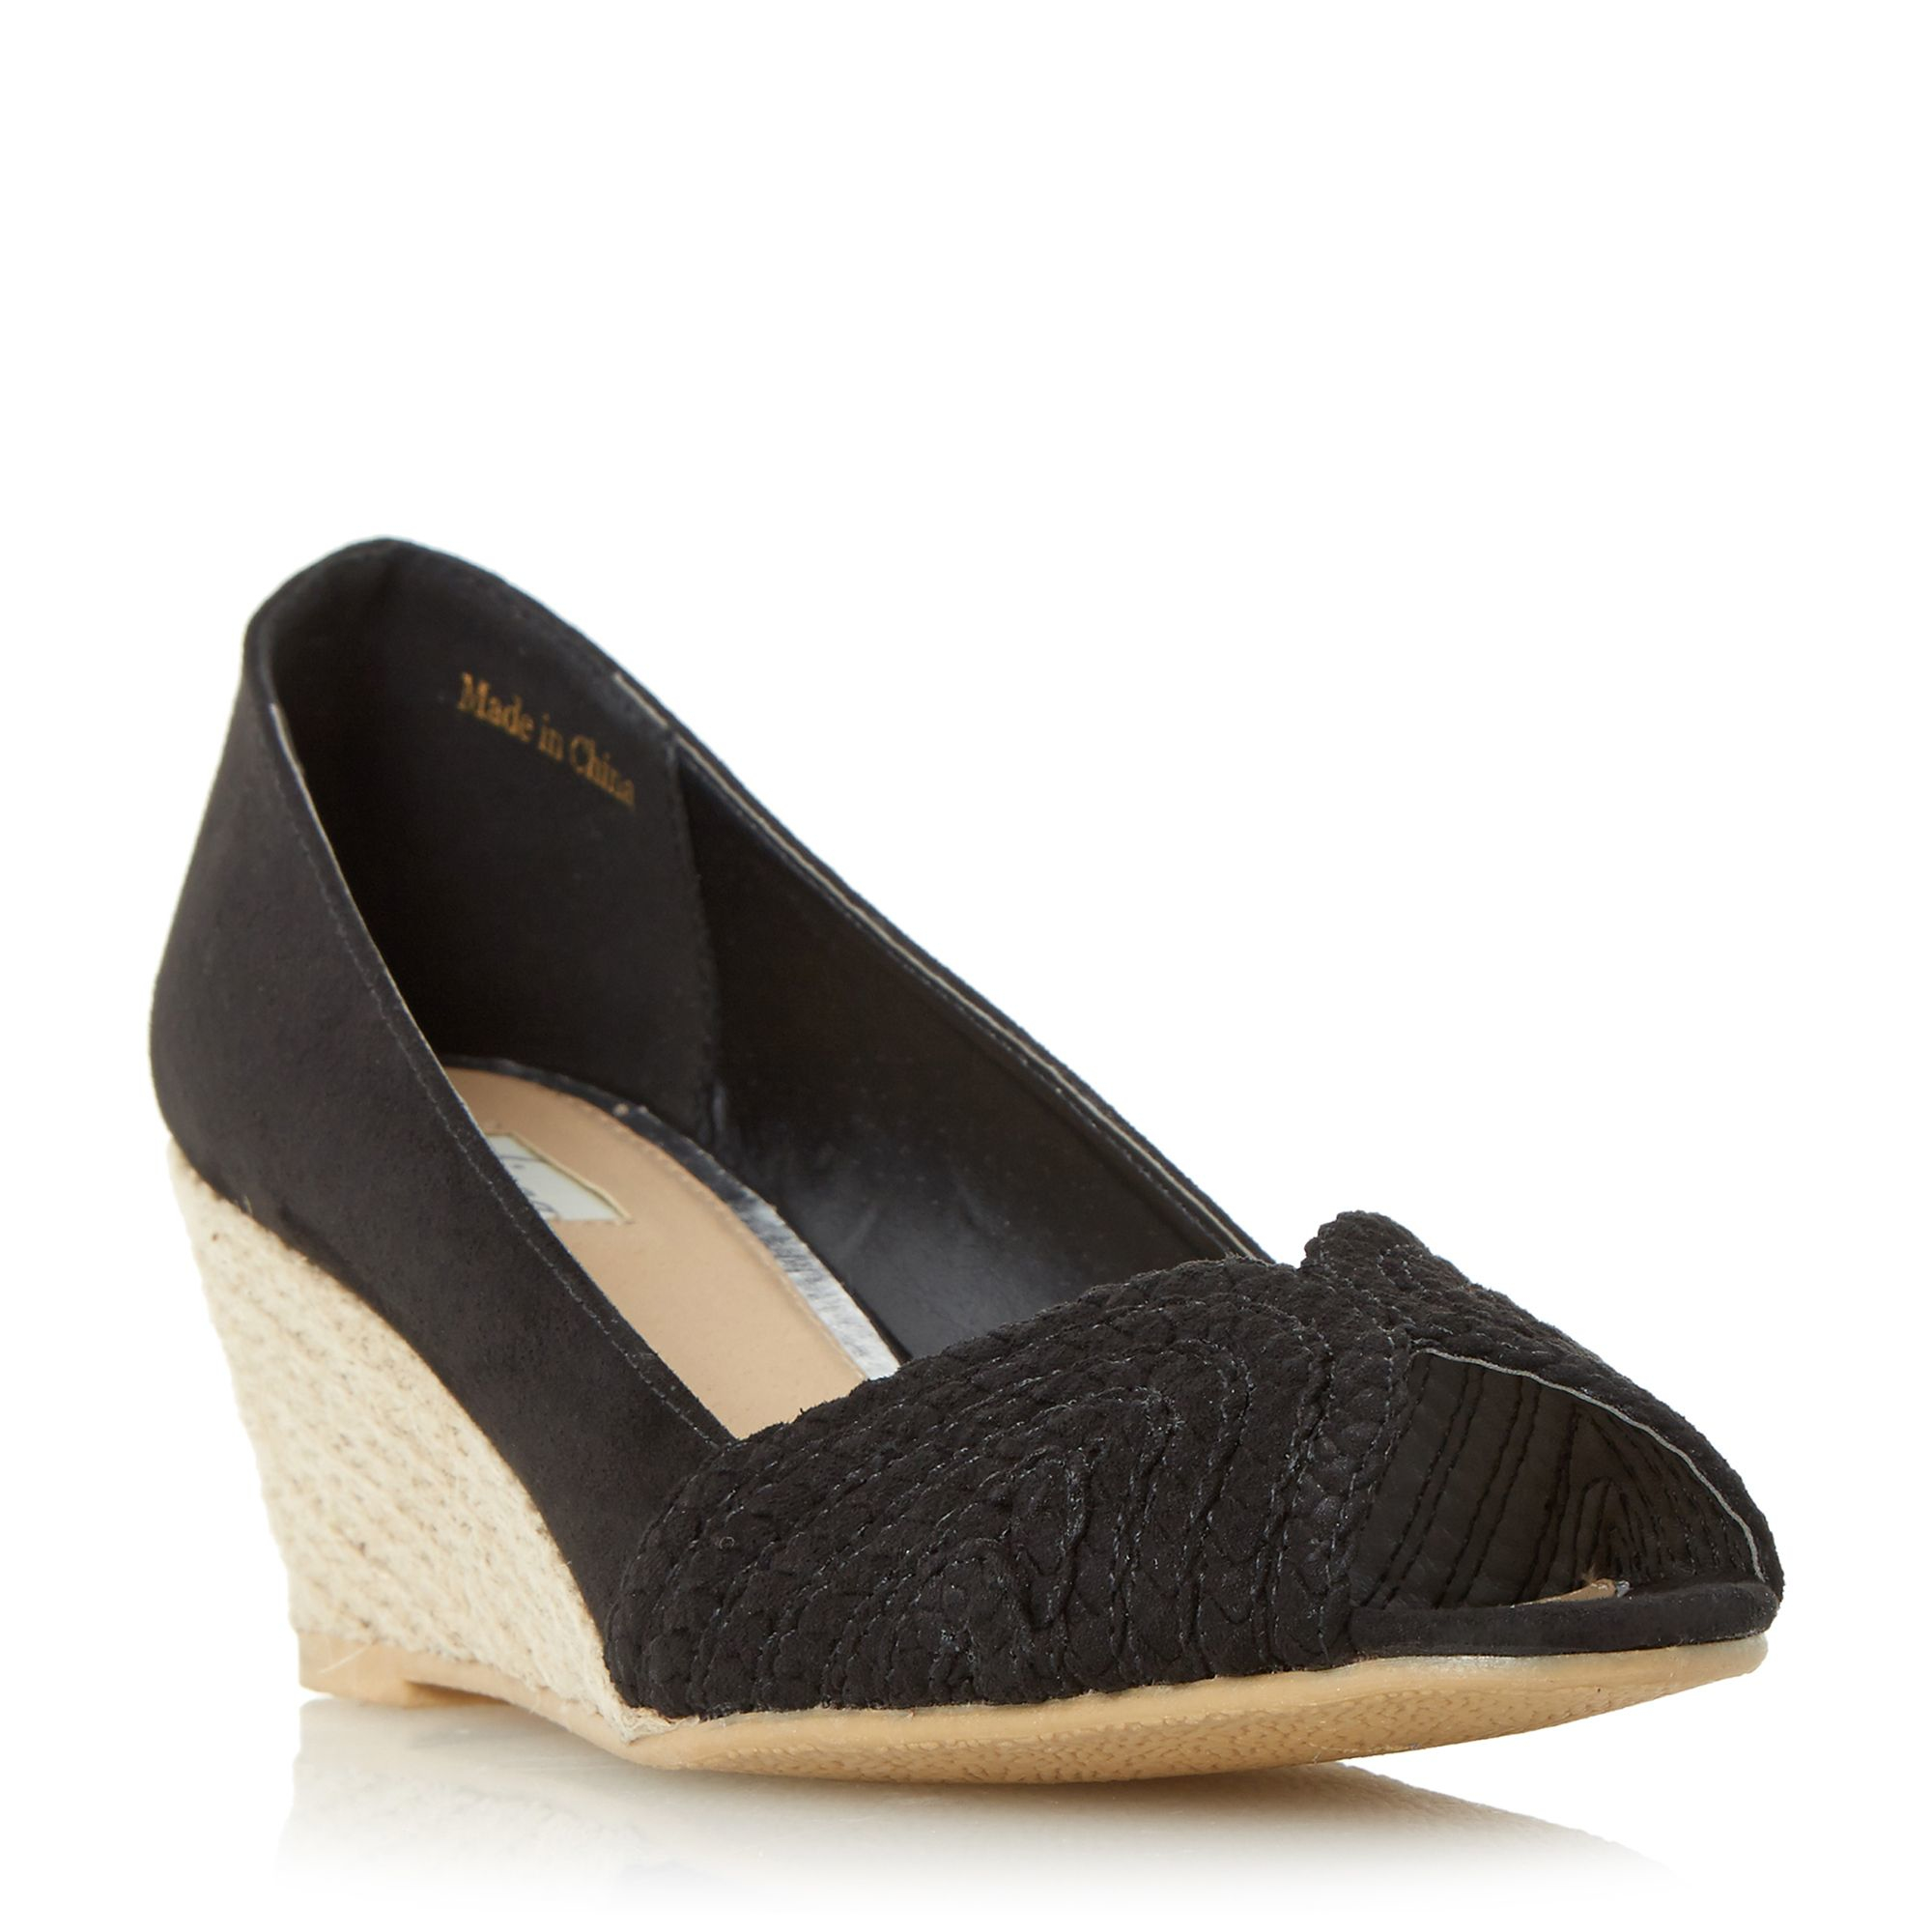 linea currio peep toe espadrille wedge shoes in black